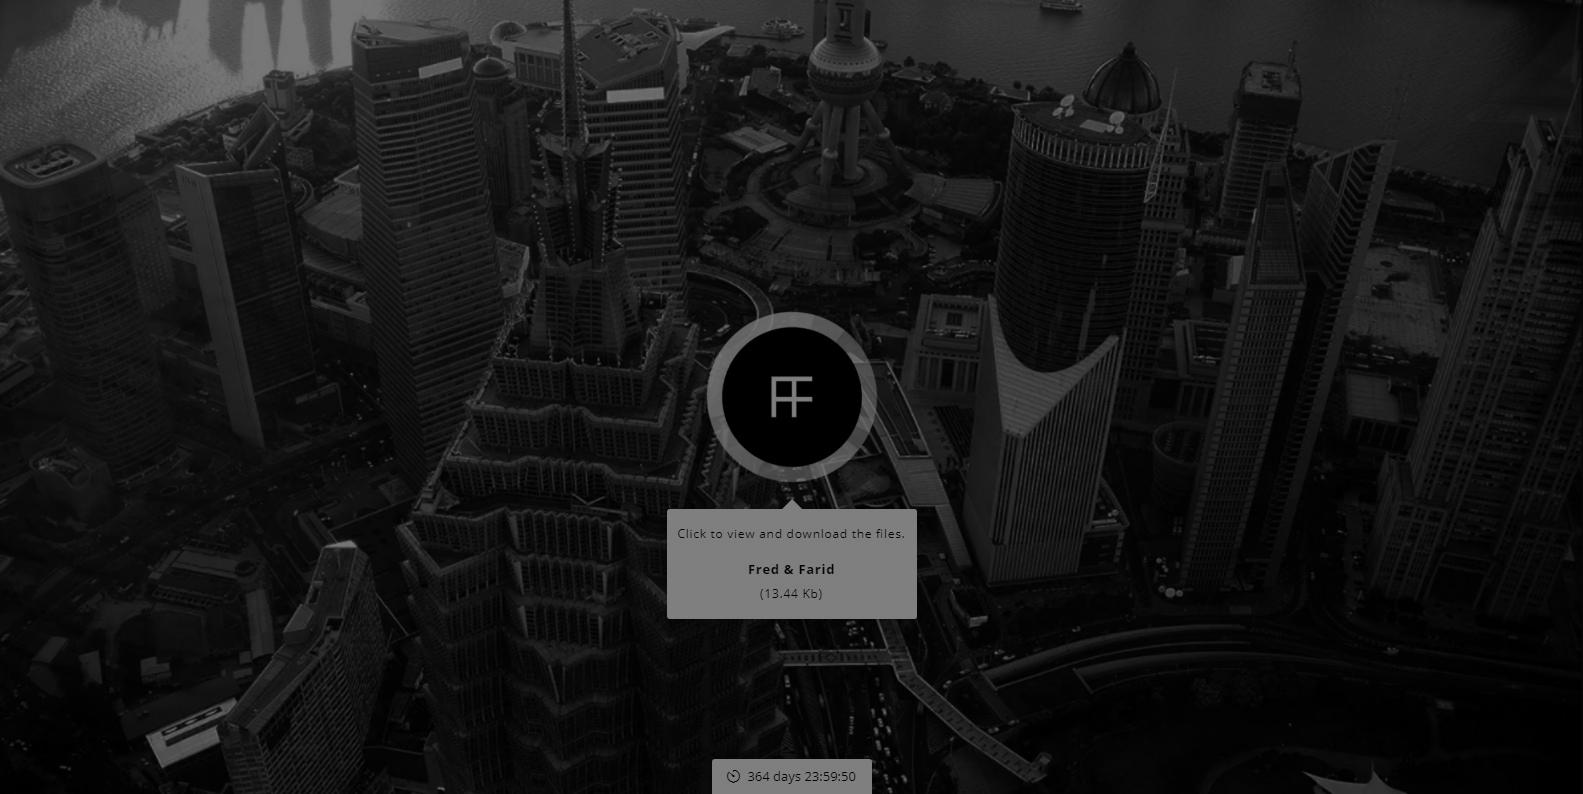 Fred & Farid - Advertising agency